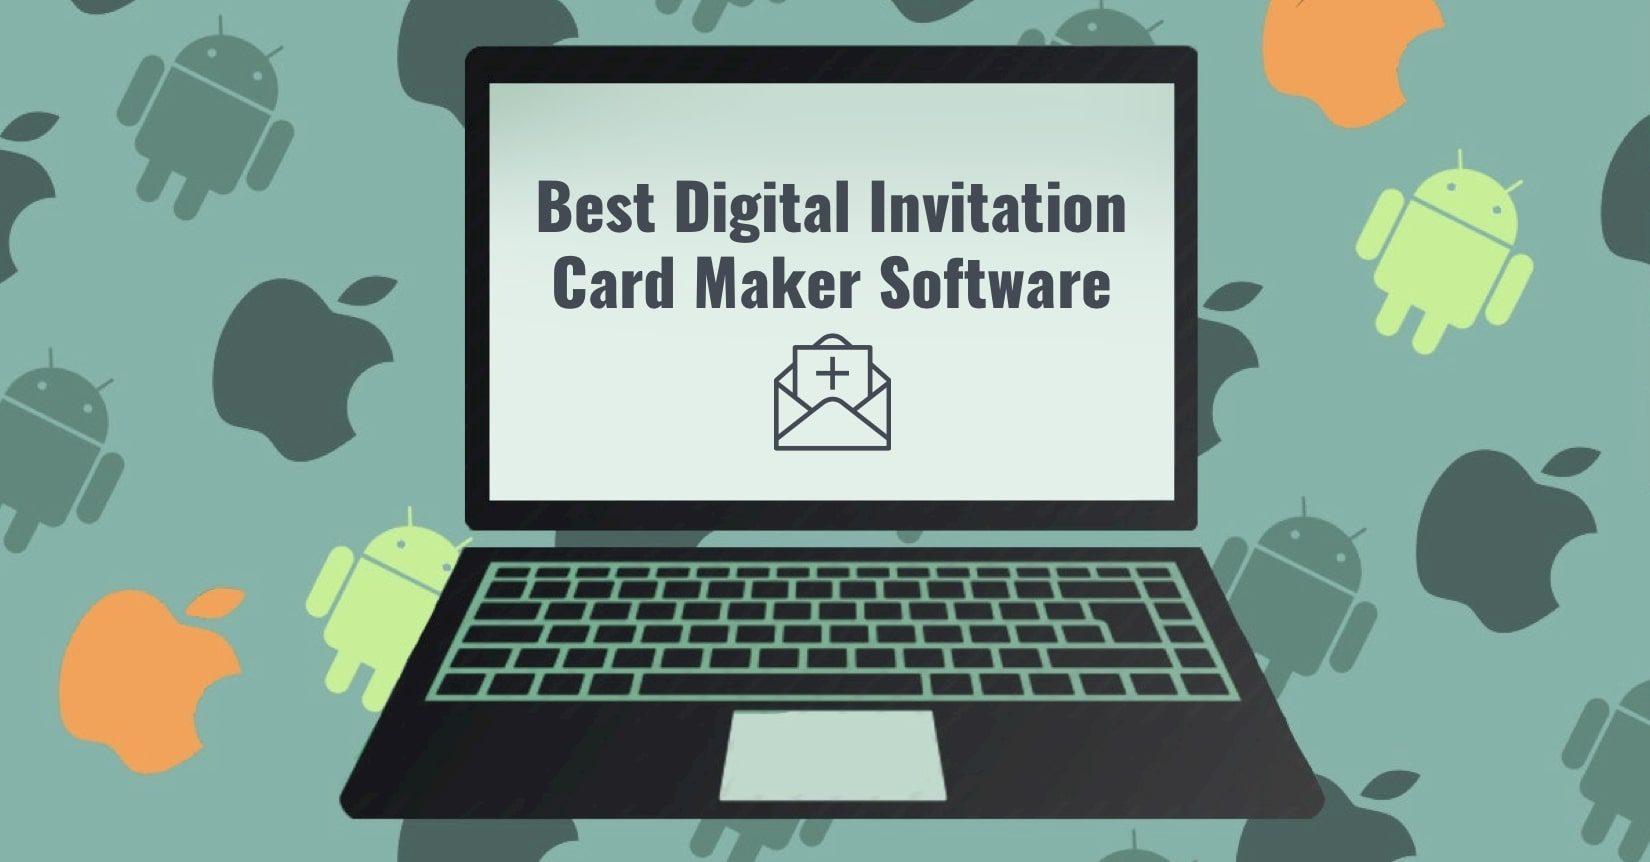 Best-Digital-Invitation-Card-Maker-Software